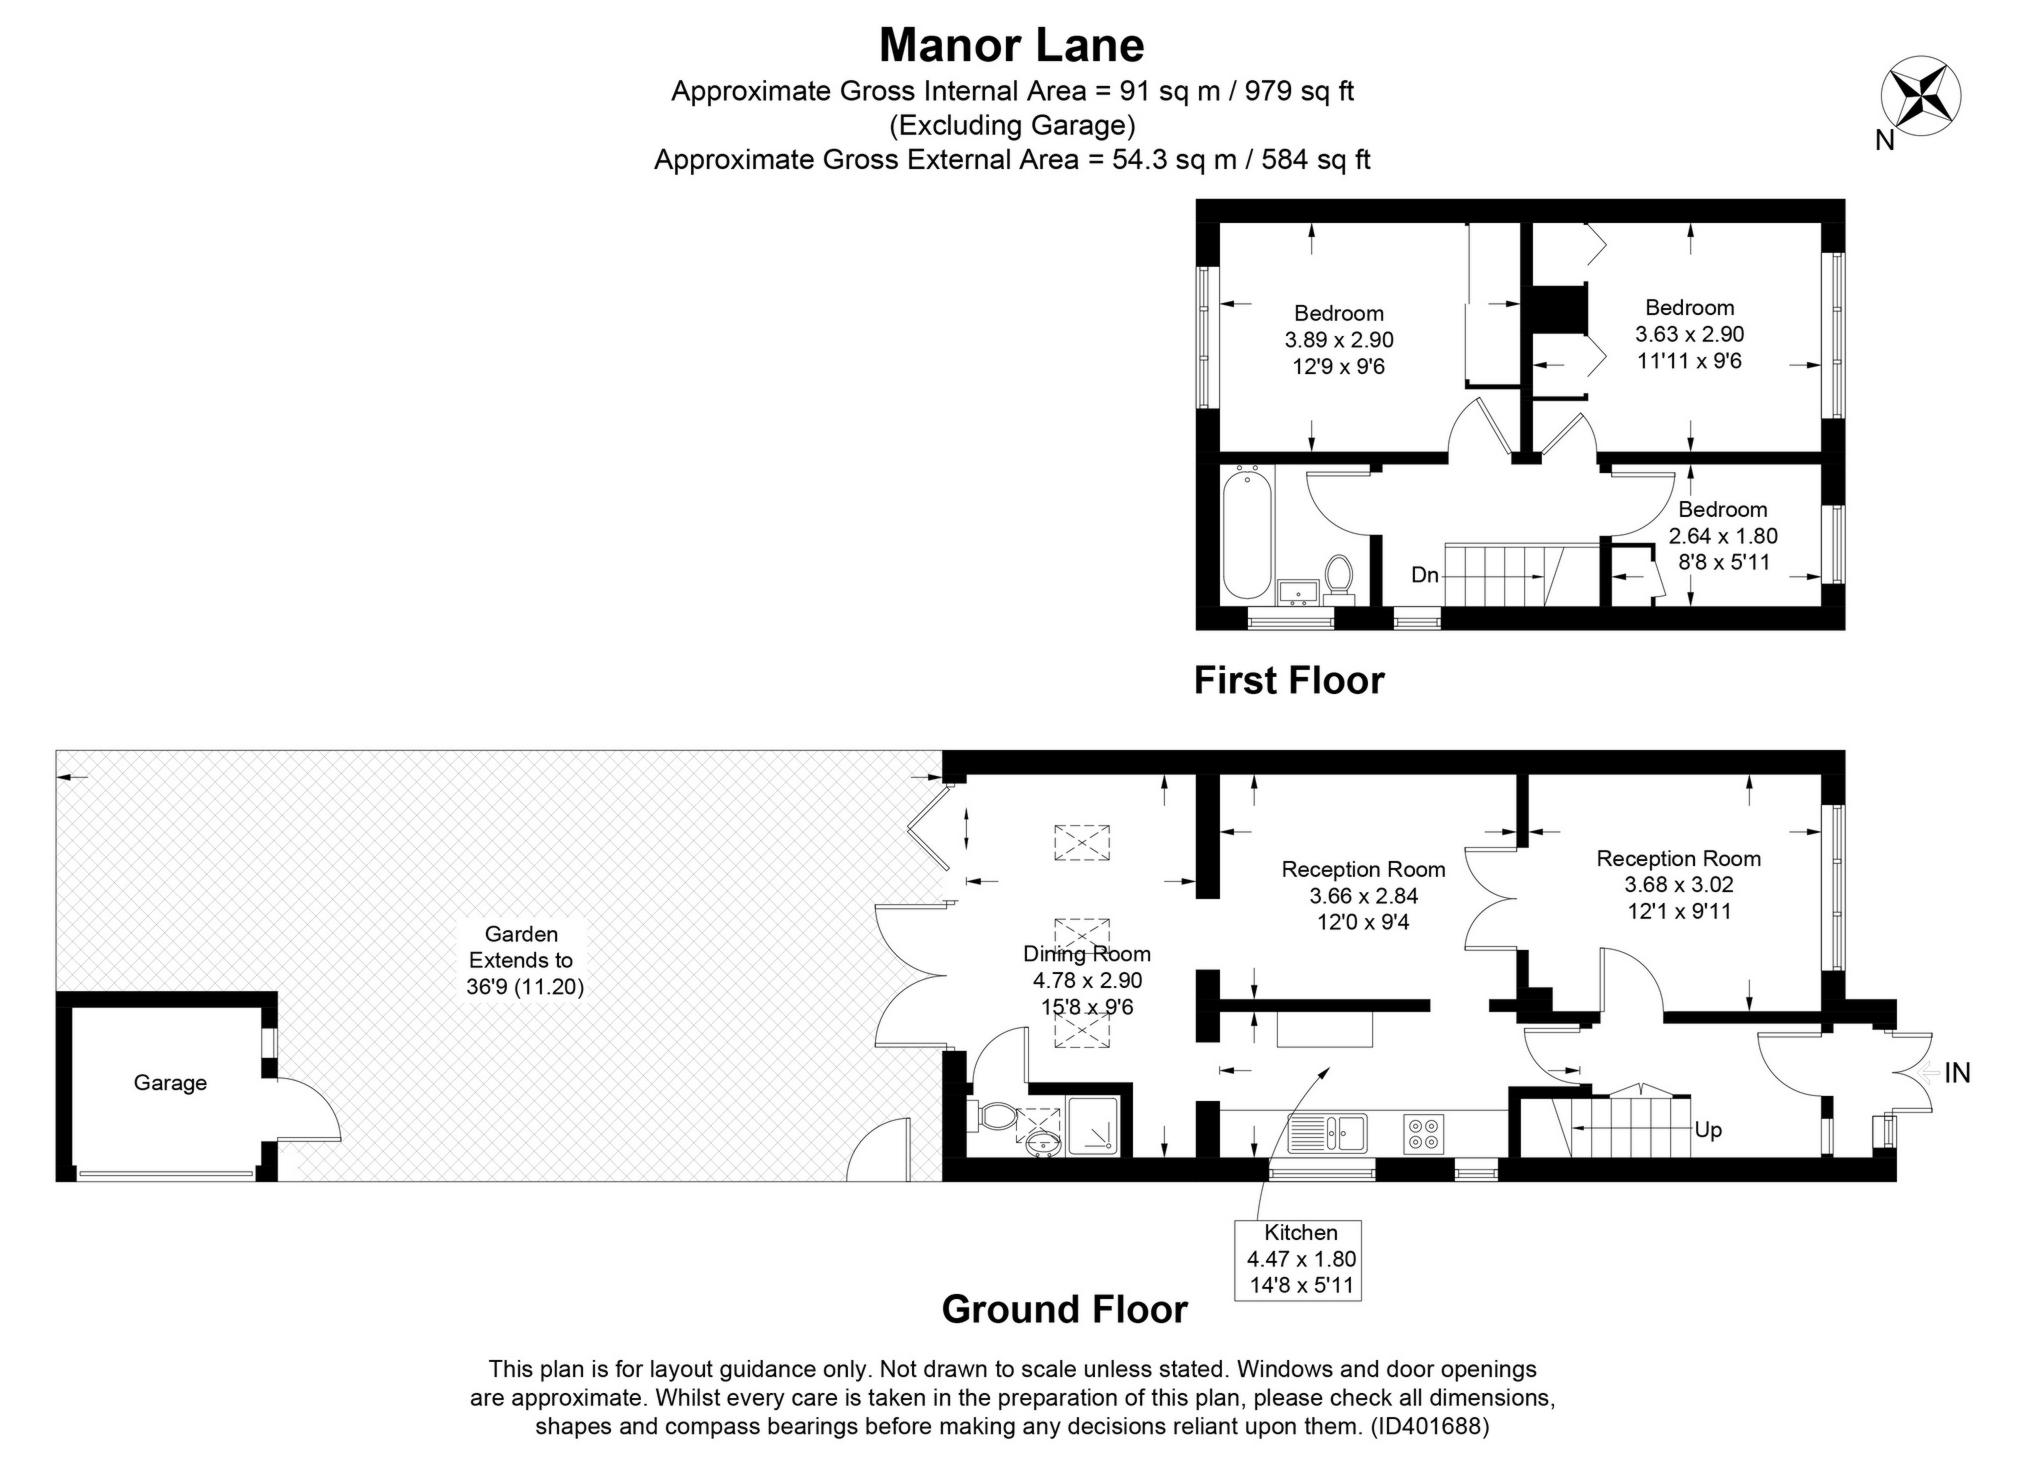 46212685 on Greenland Village Of Plan Property